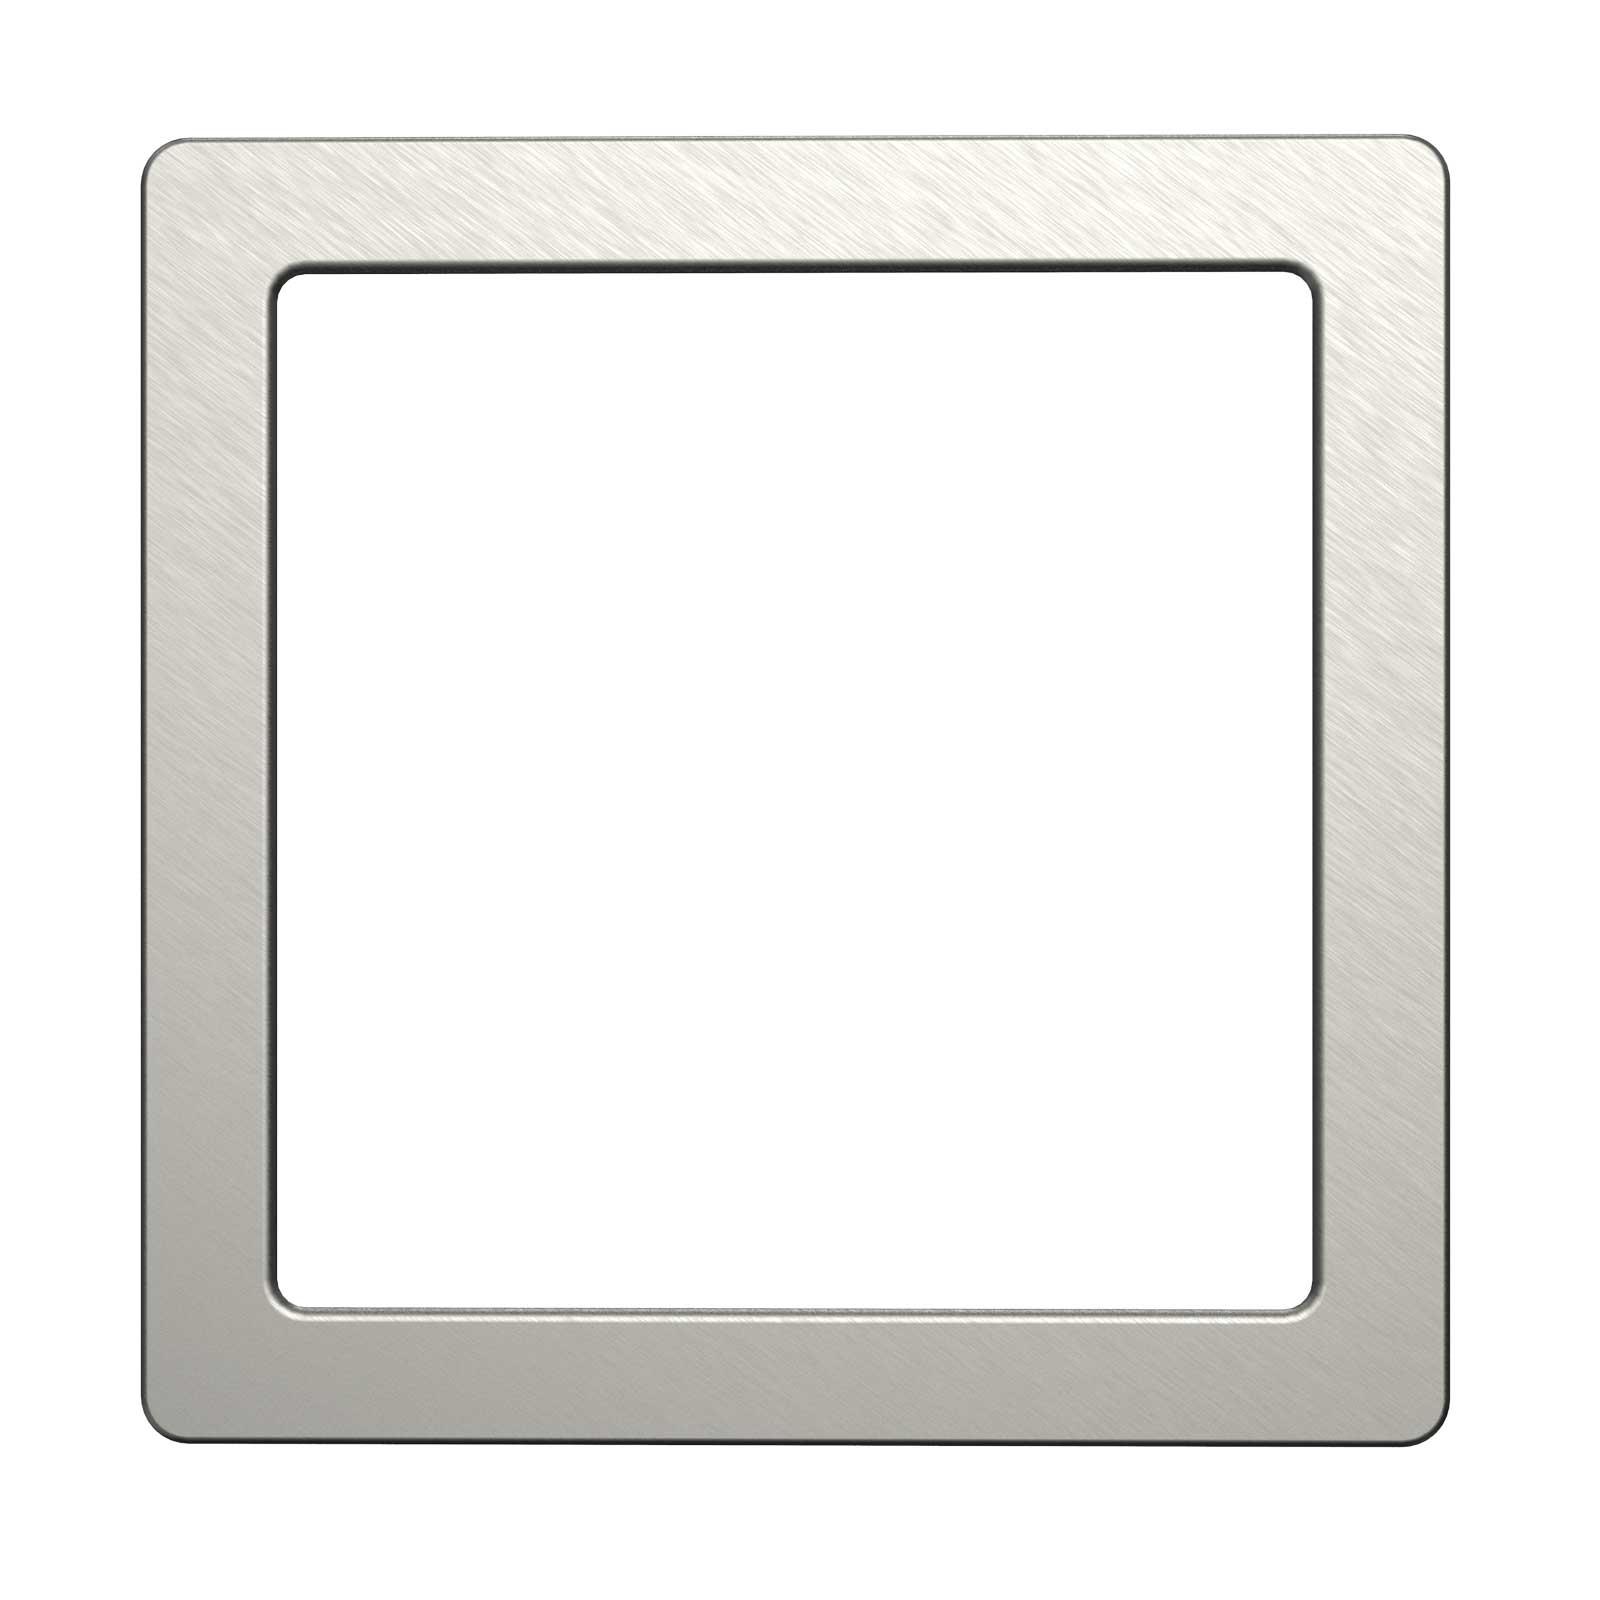 Megatron Pano magnetic cover angular Ø 21.7cm